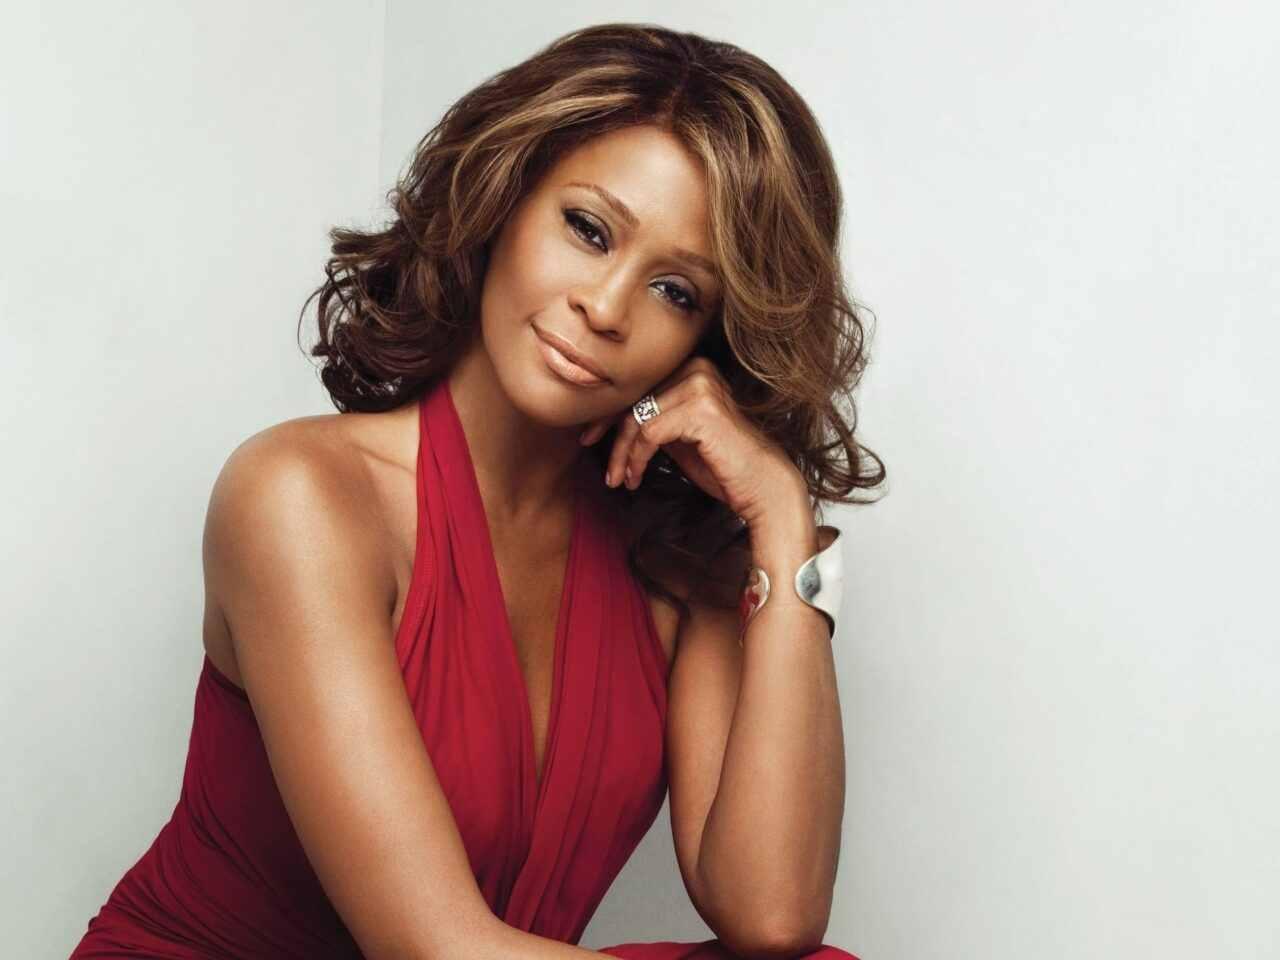 http://2.bp.blogspot.com/-JnxLZ55-kG8/TzcxiYBXsPI/AAAAAAAACOI/kW8vd3YIj0M/s1600/Whitney-Houston-006.jpg